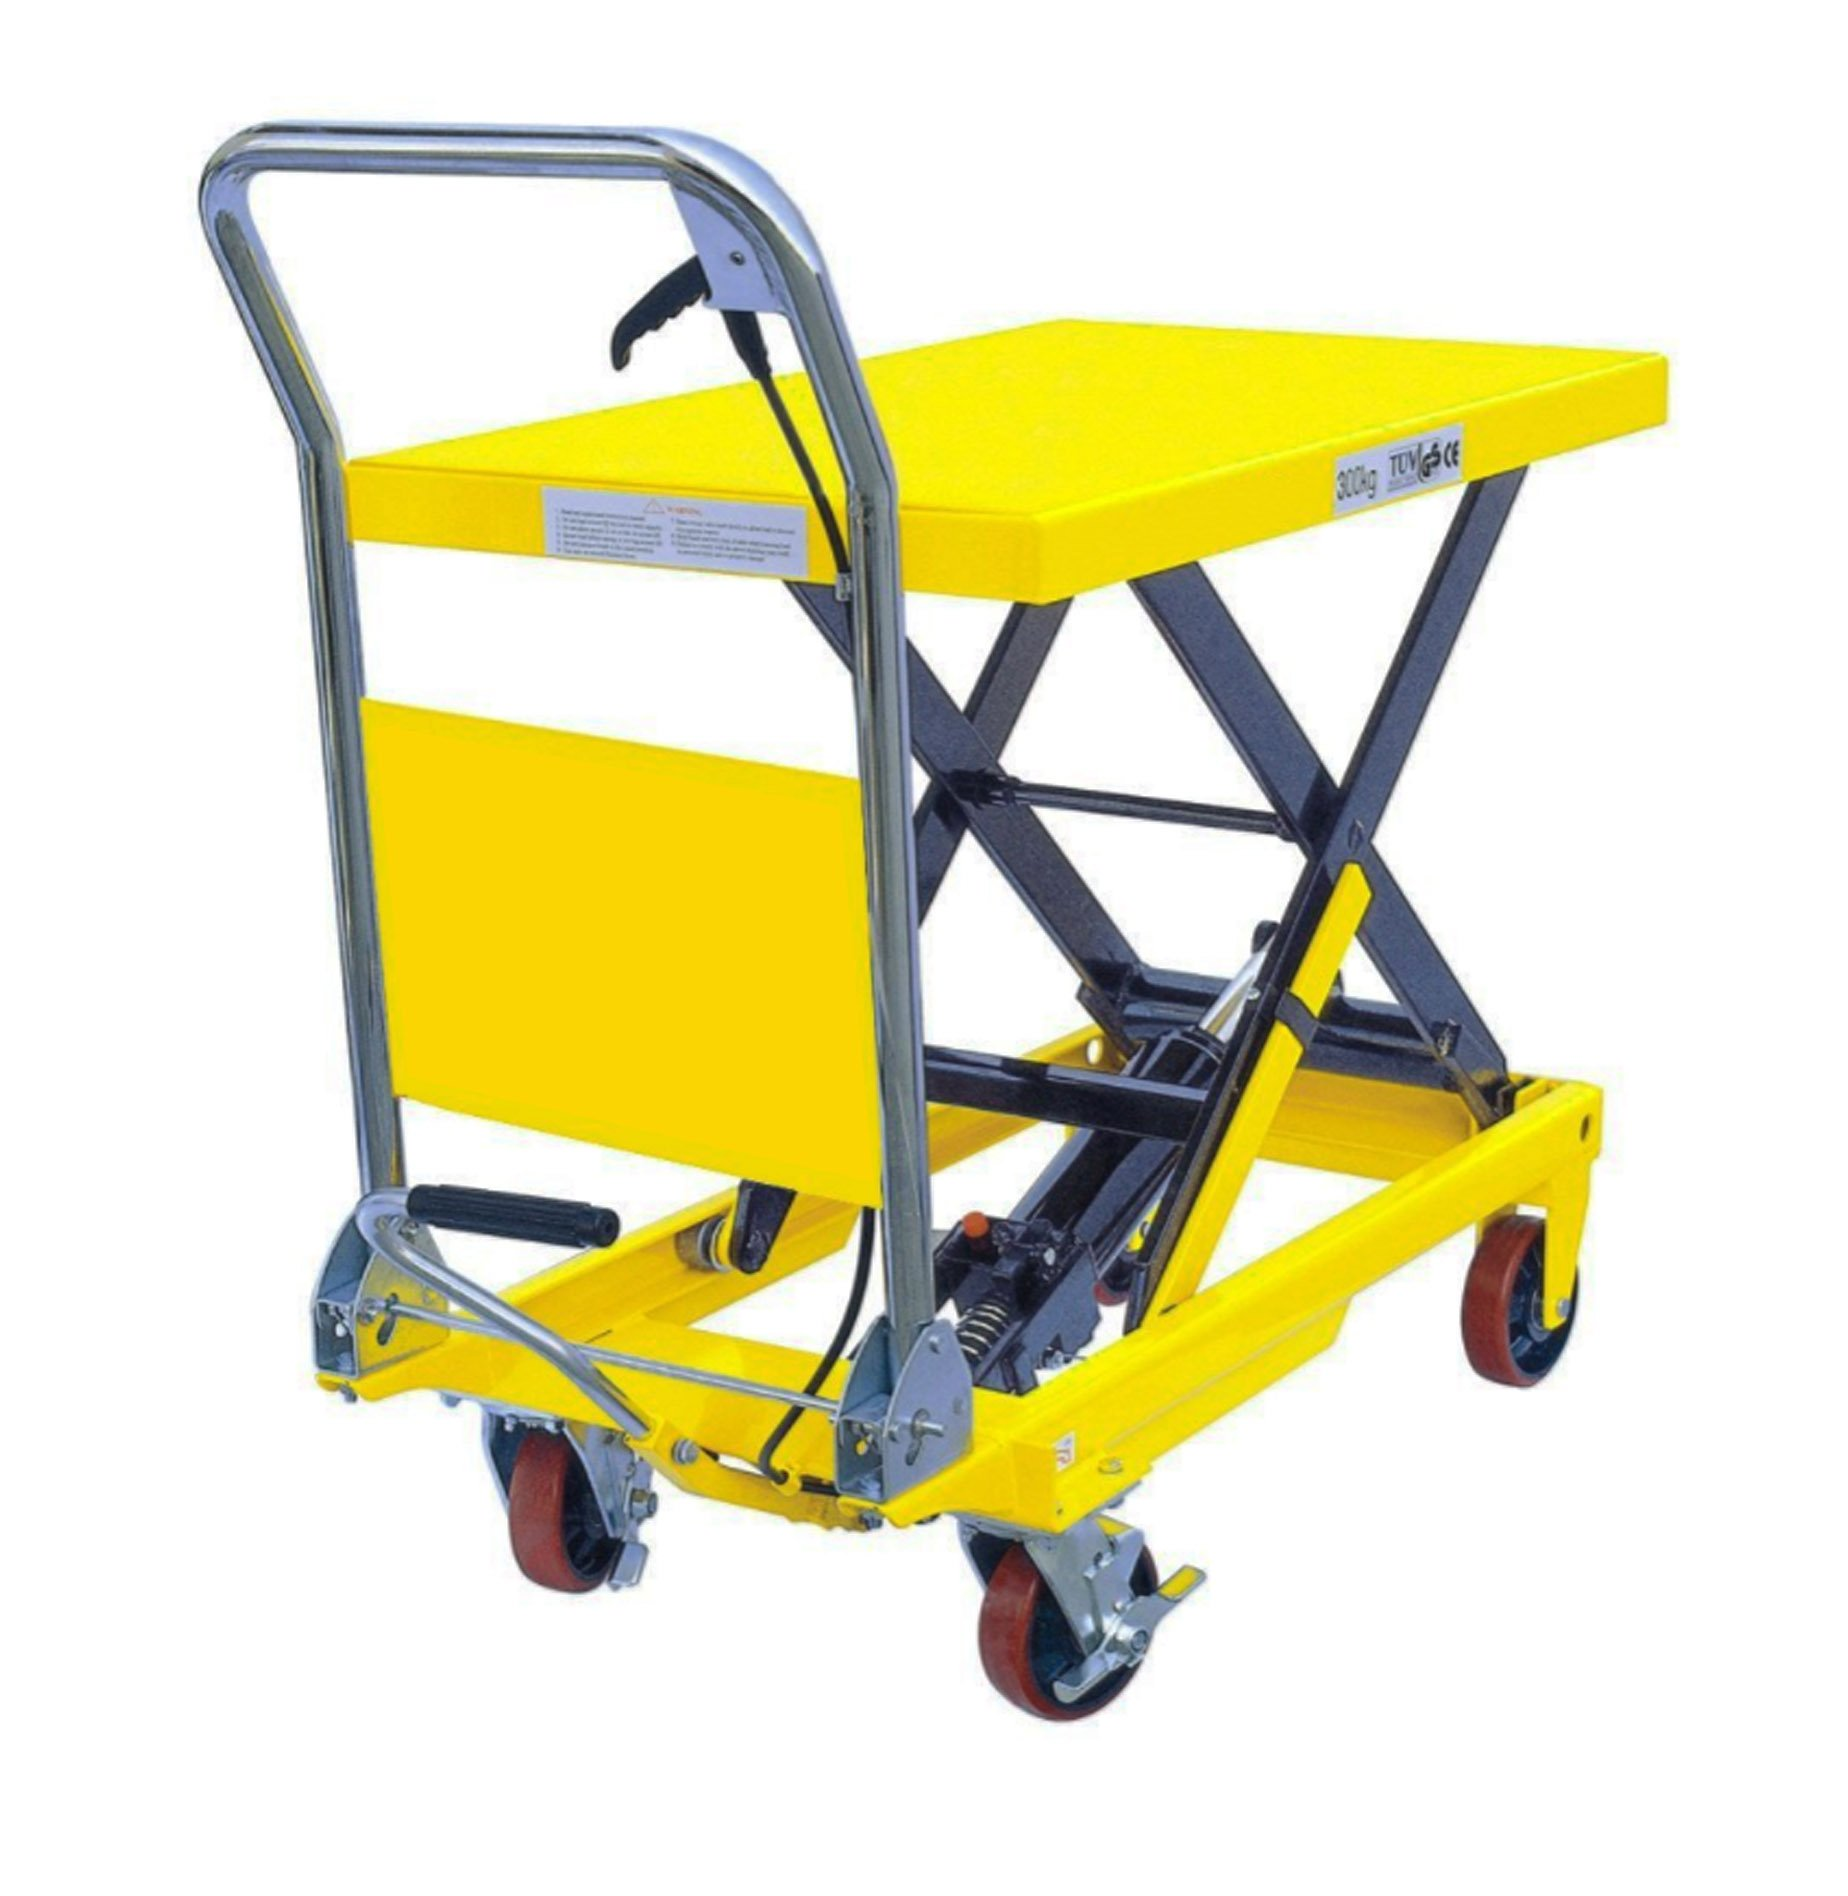 XILIN XSP500 Hydraulic Scissor Lift Table Truck, Yellow, 1100 lb. Capacity